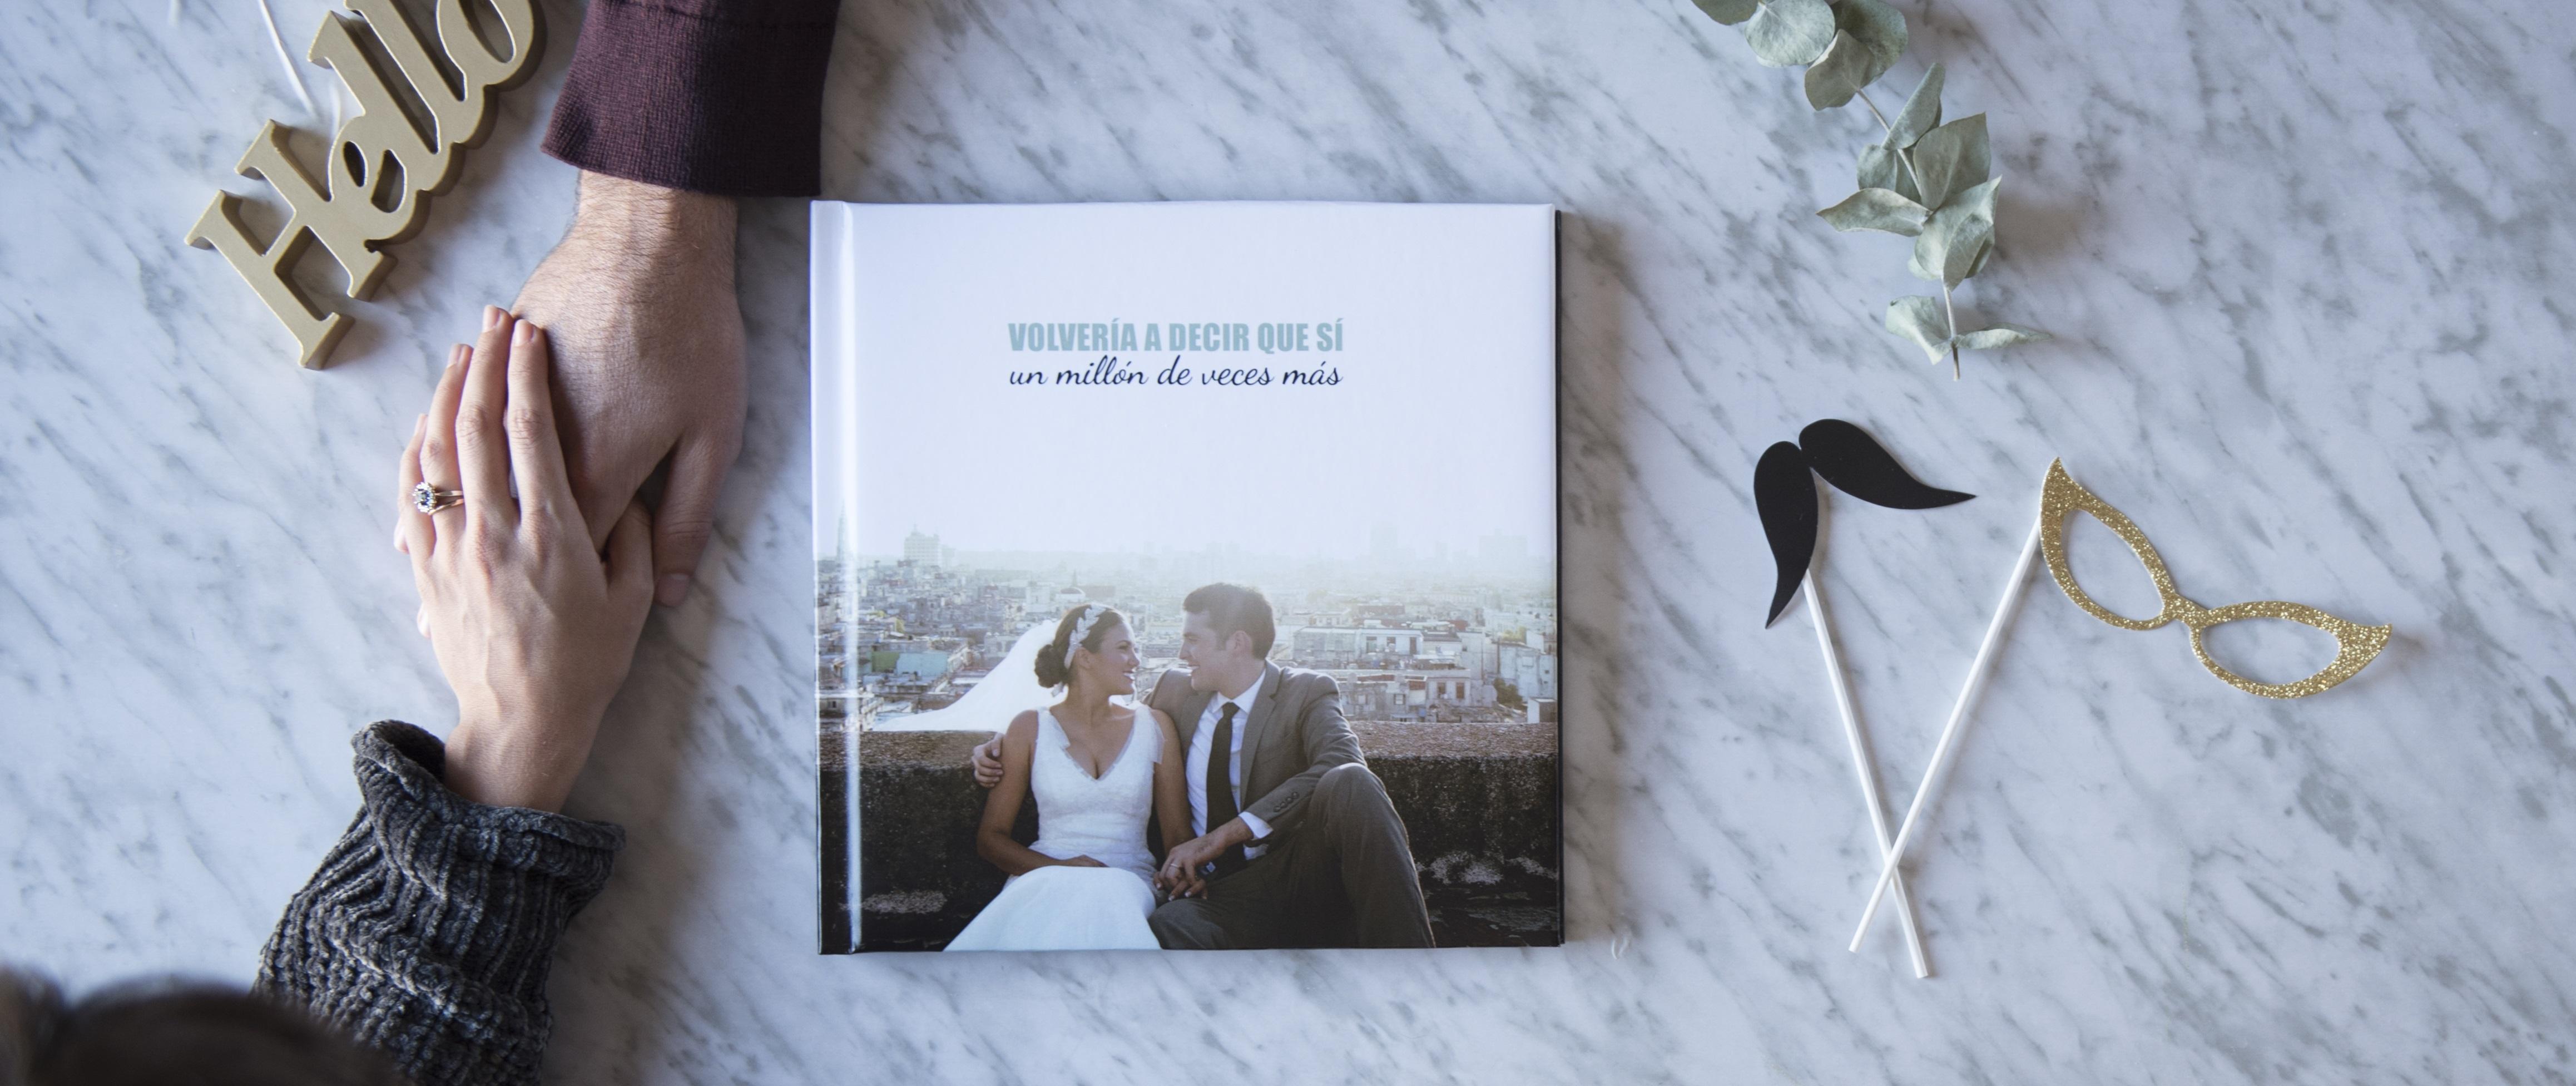 8 ideas de lbum hofmann para regalar en san valent n - Album para san valentin ...